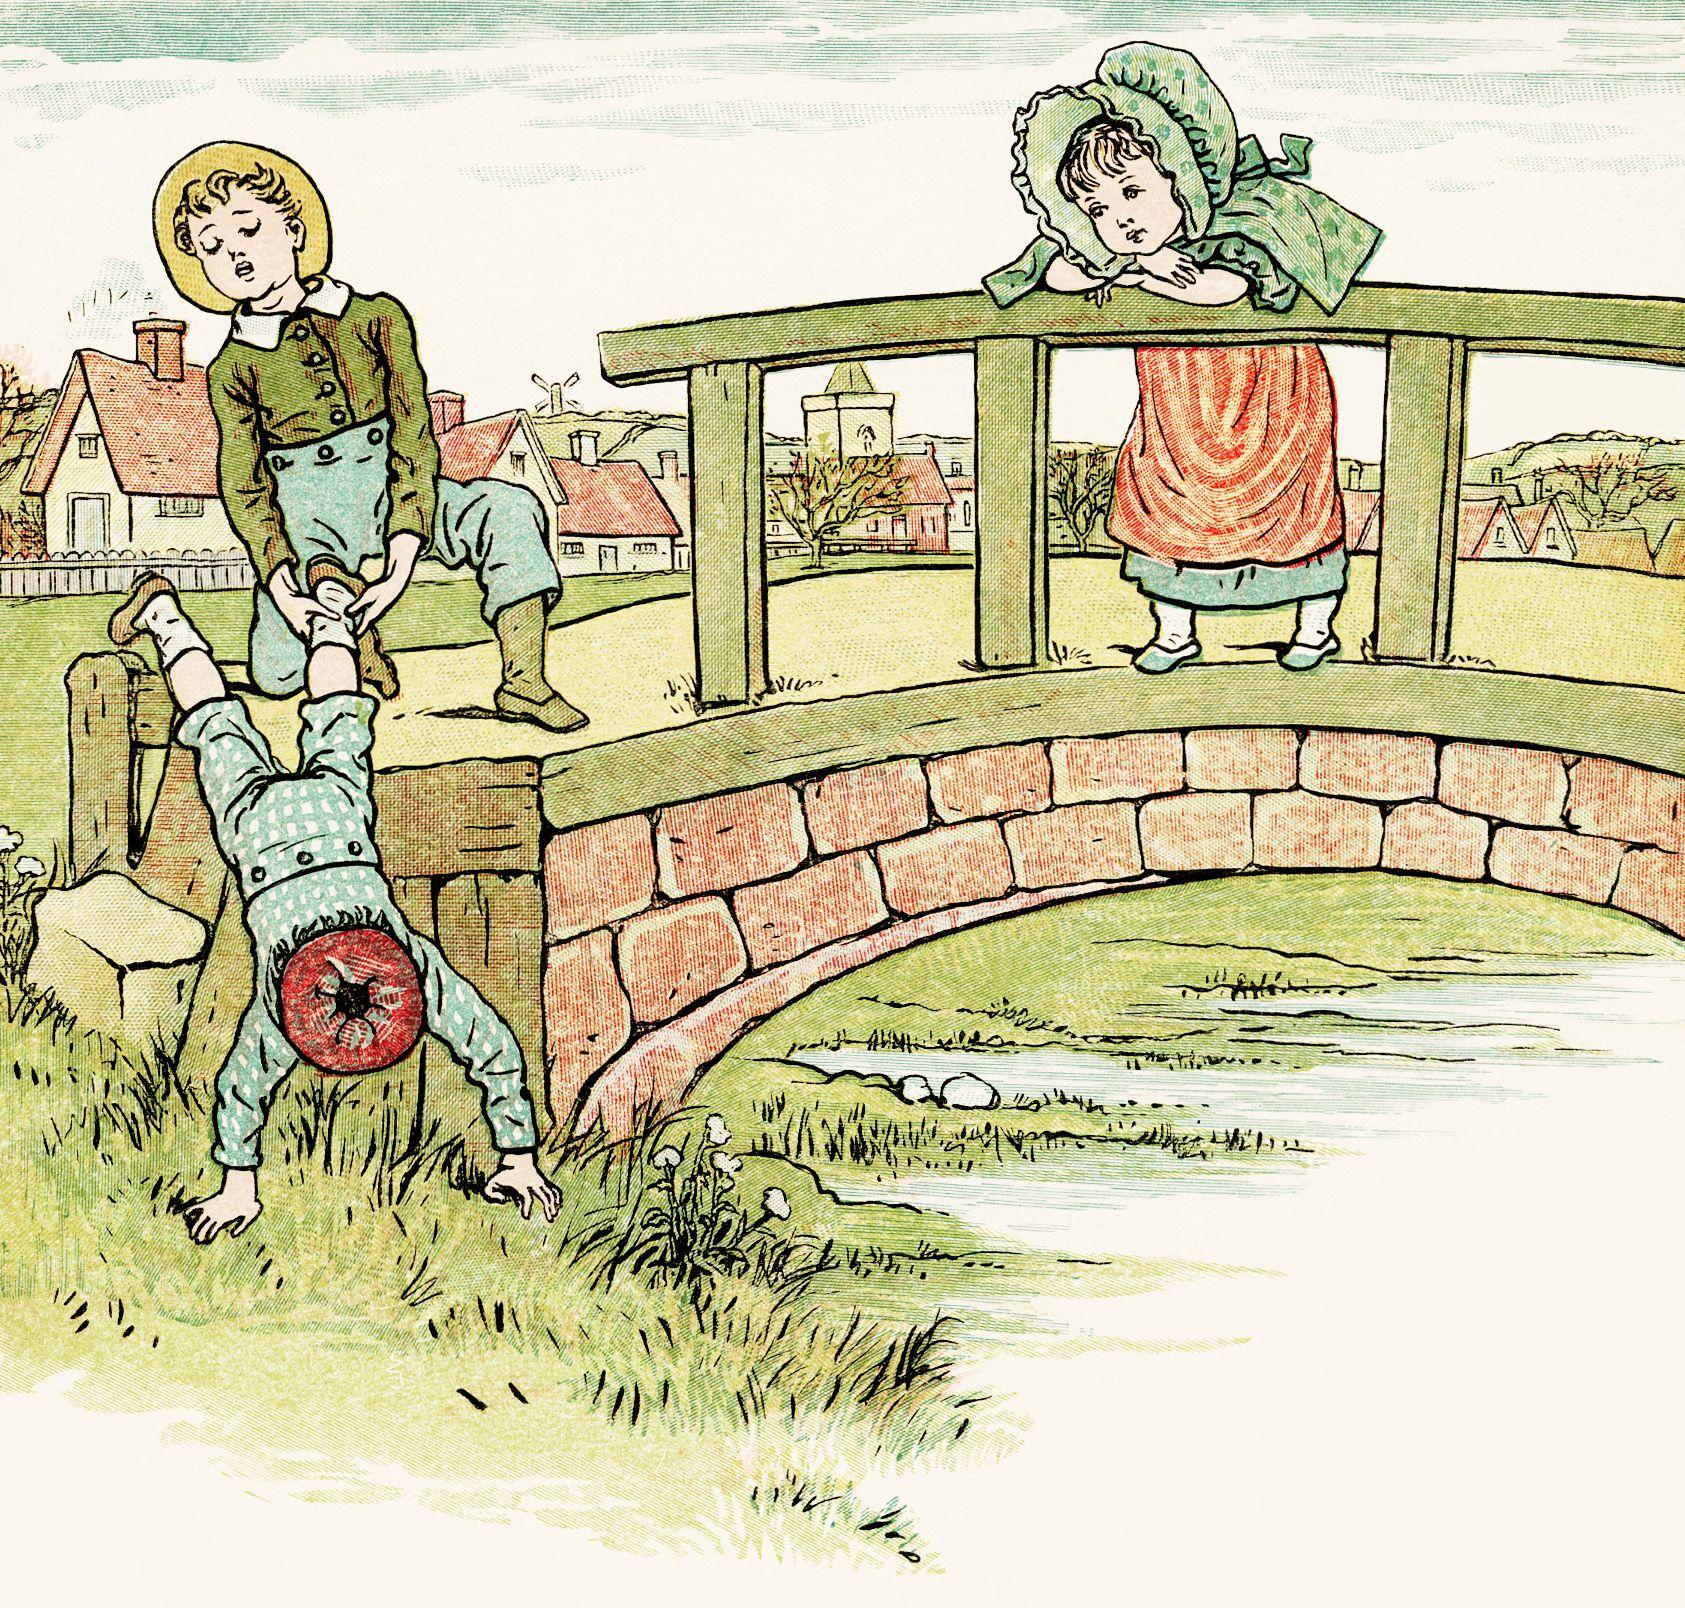 Free Digital Image Vintage Illustrated Children S Book Page Childrens Books Illustrations Old Children S Books Children S Book Illustration